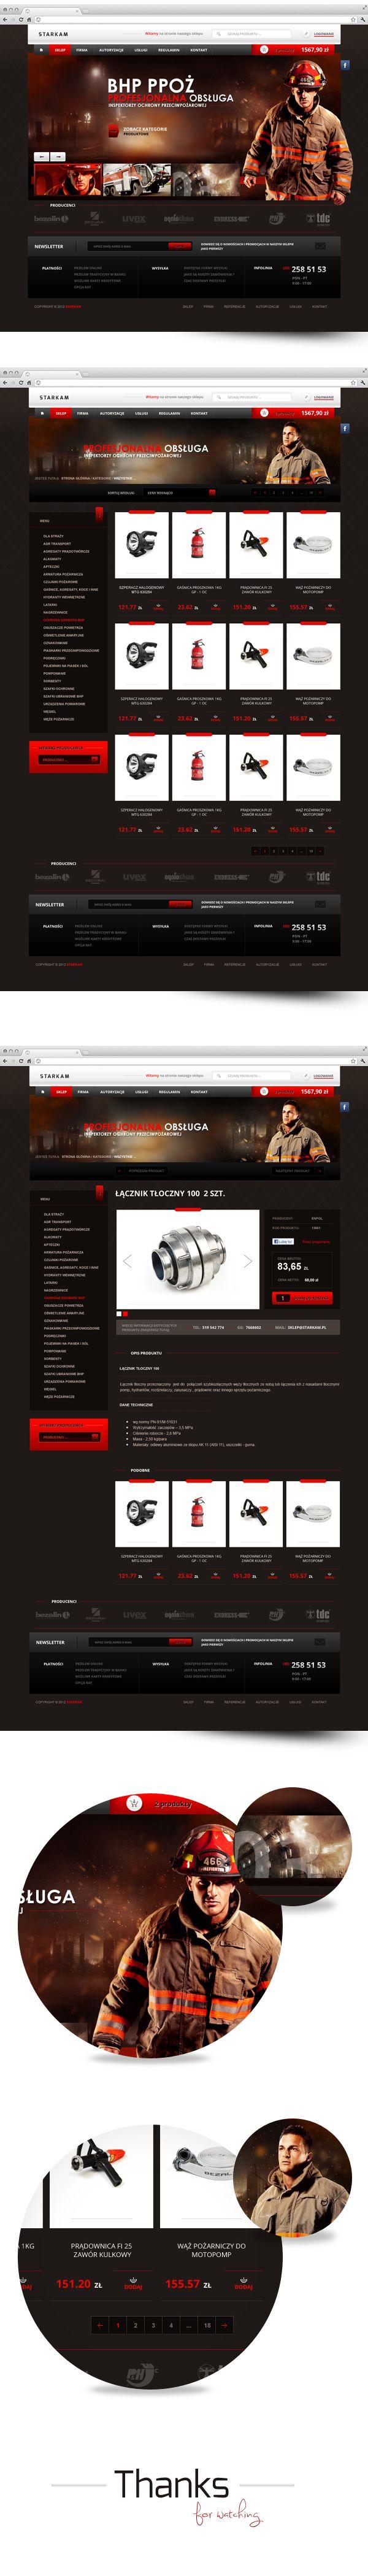 Starkam by Carlo, via #Behance #Webdesign